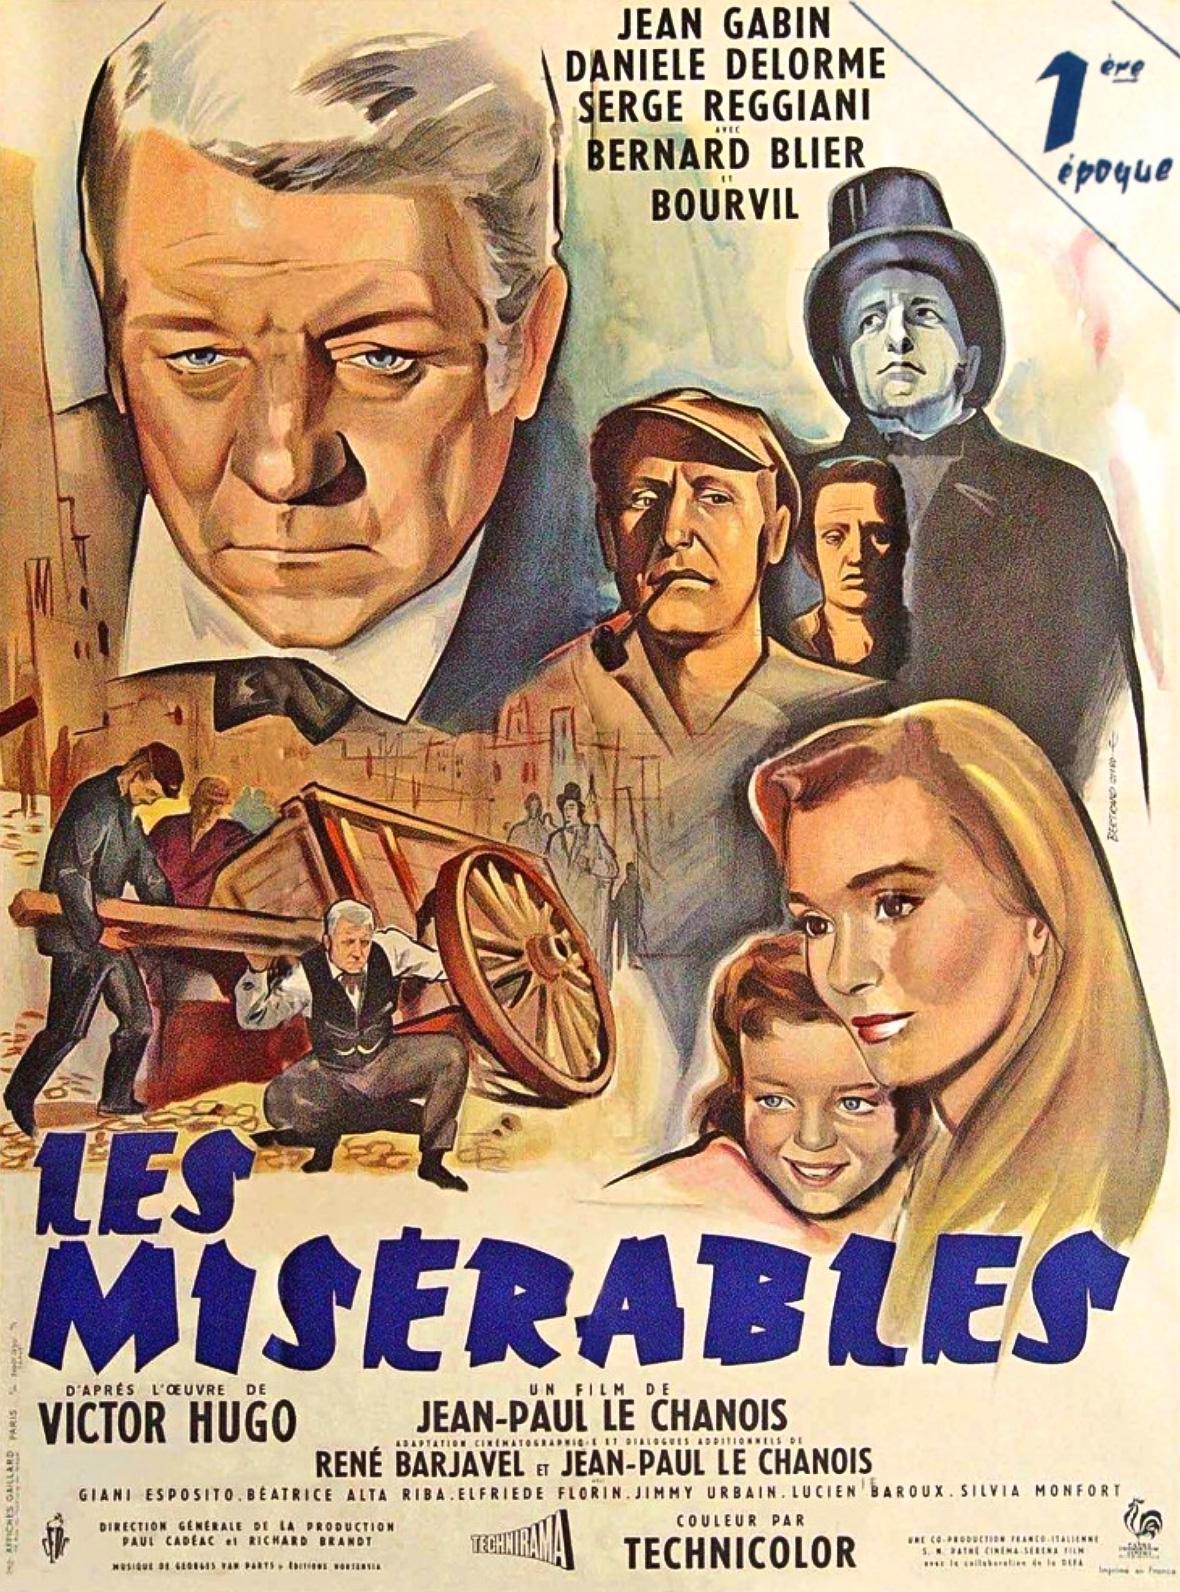 مشاهدة فيلم Les Misérables 1958 مترجم